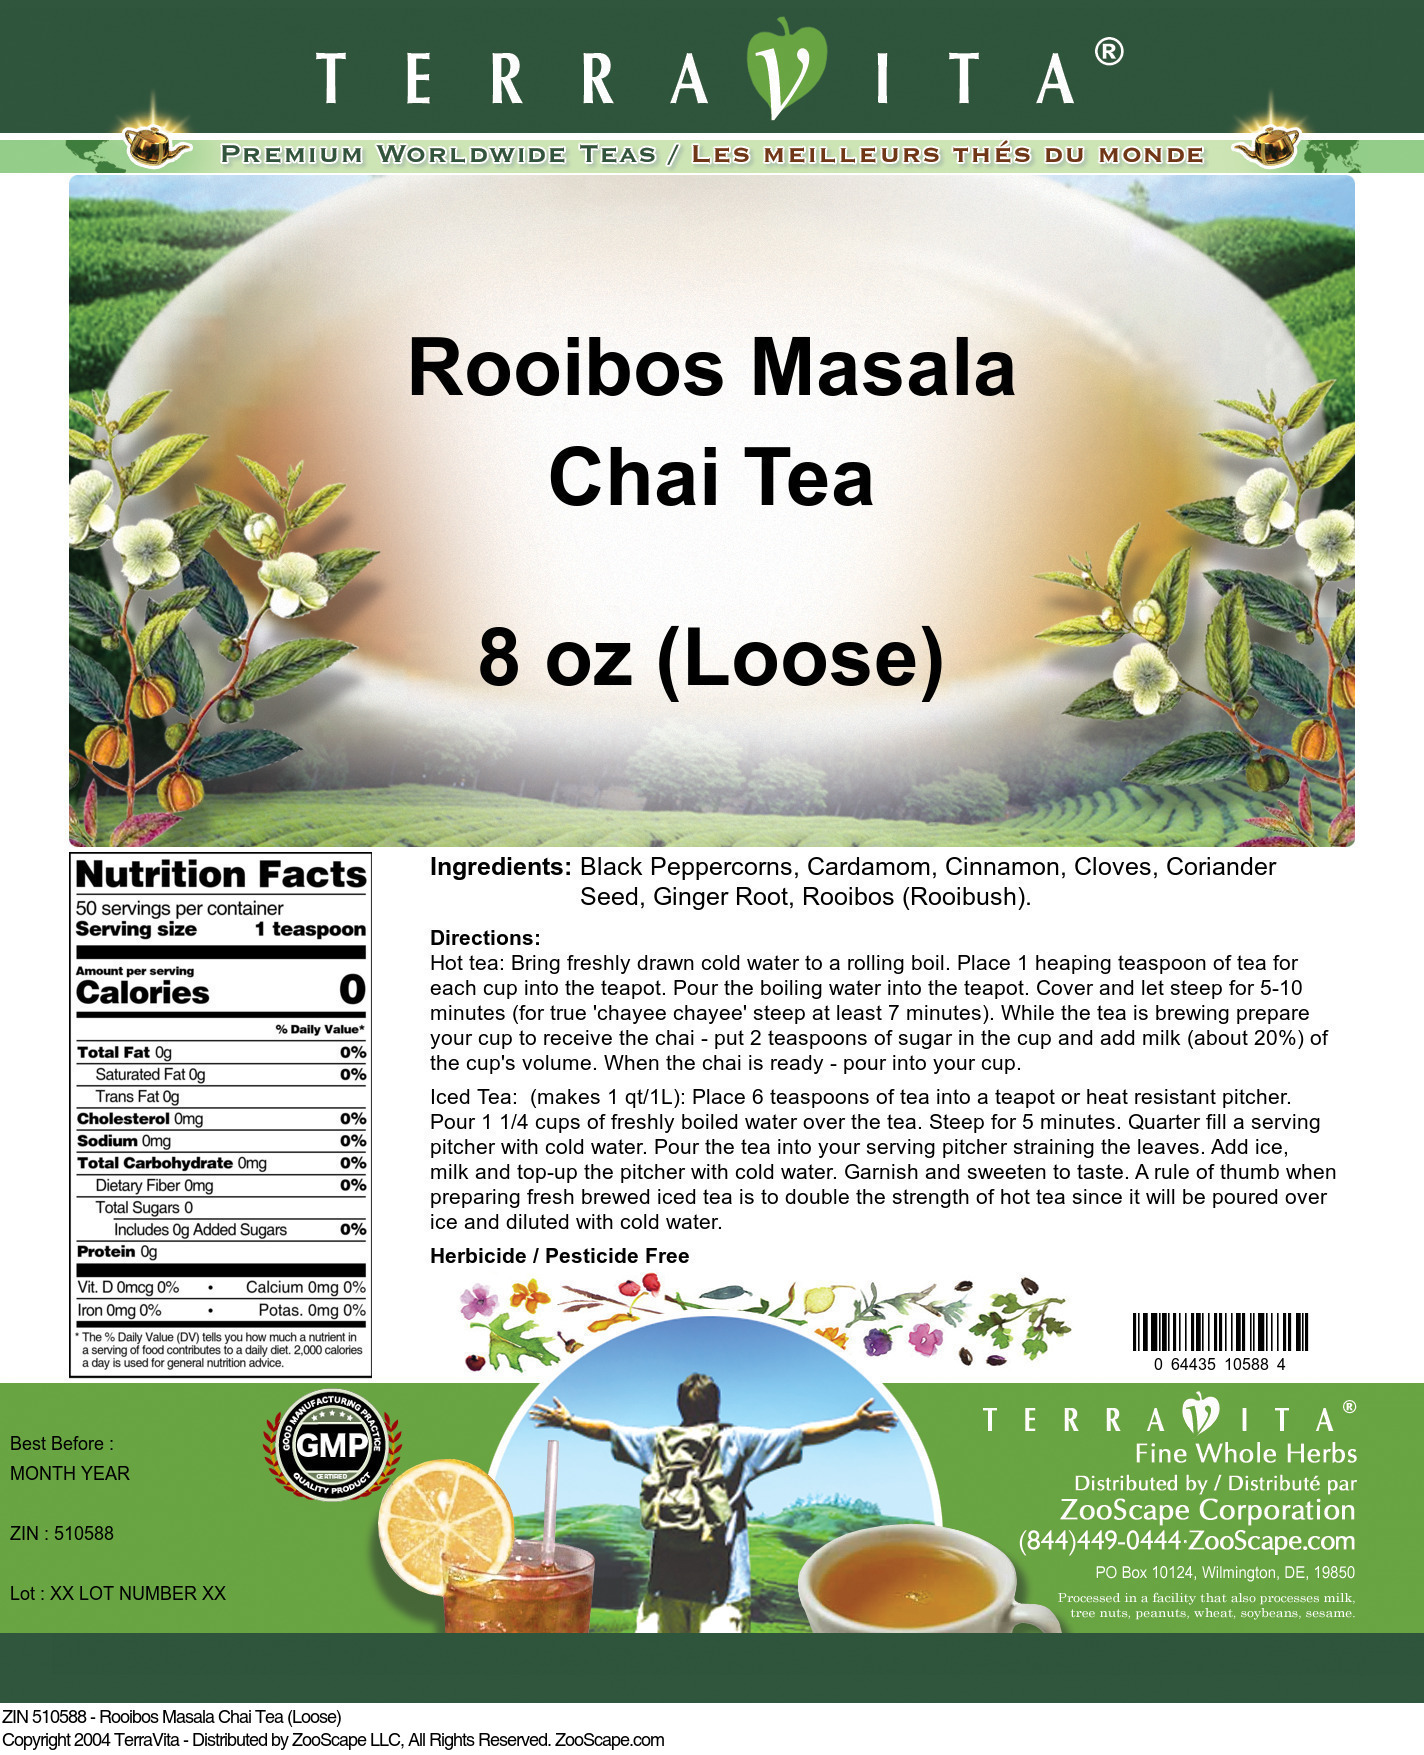 Rooibos Masala Chai